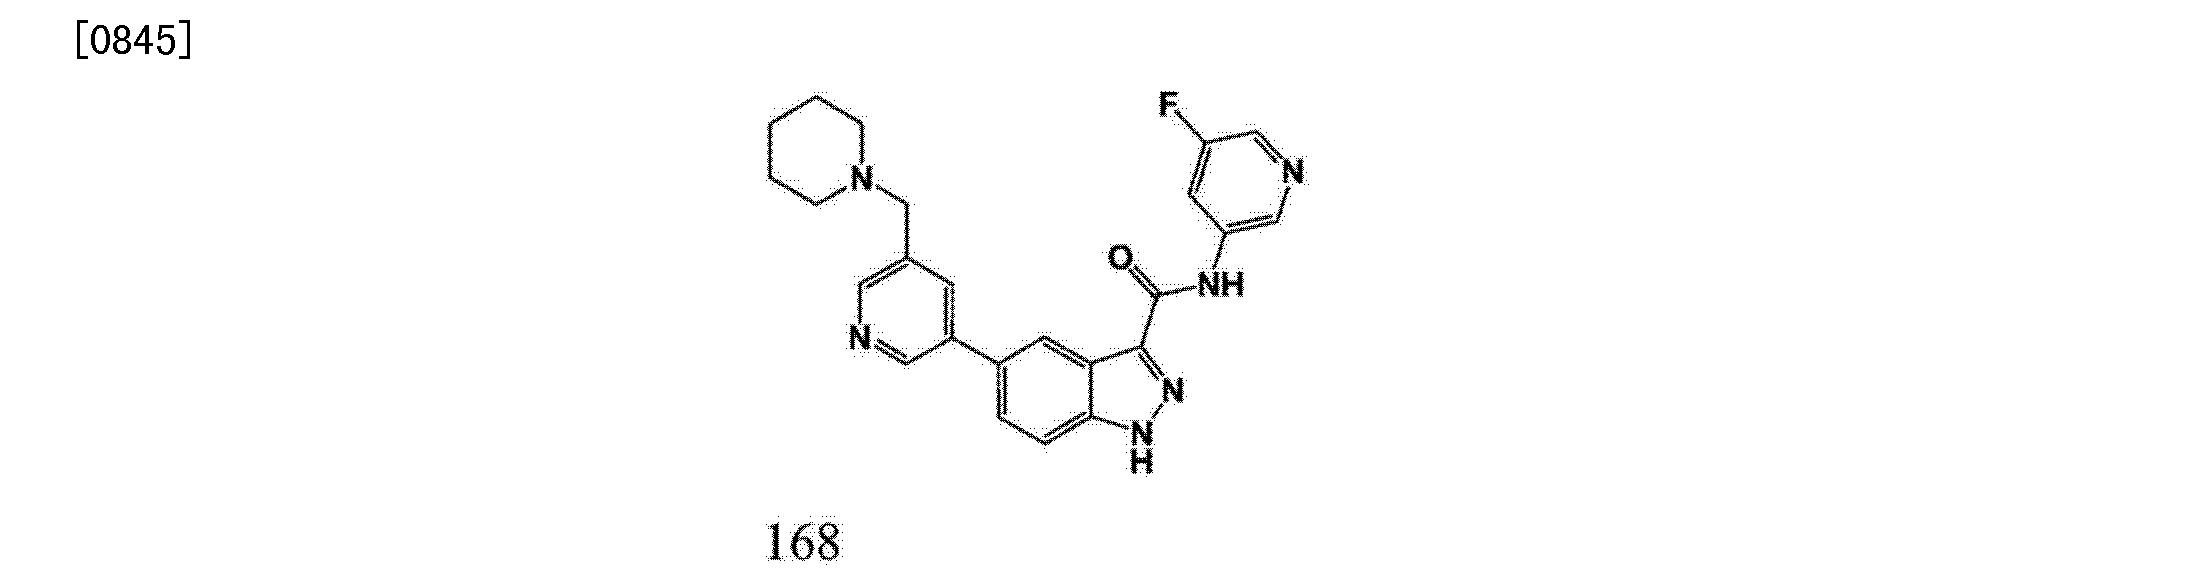 Figure CN103929963AD02003